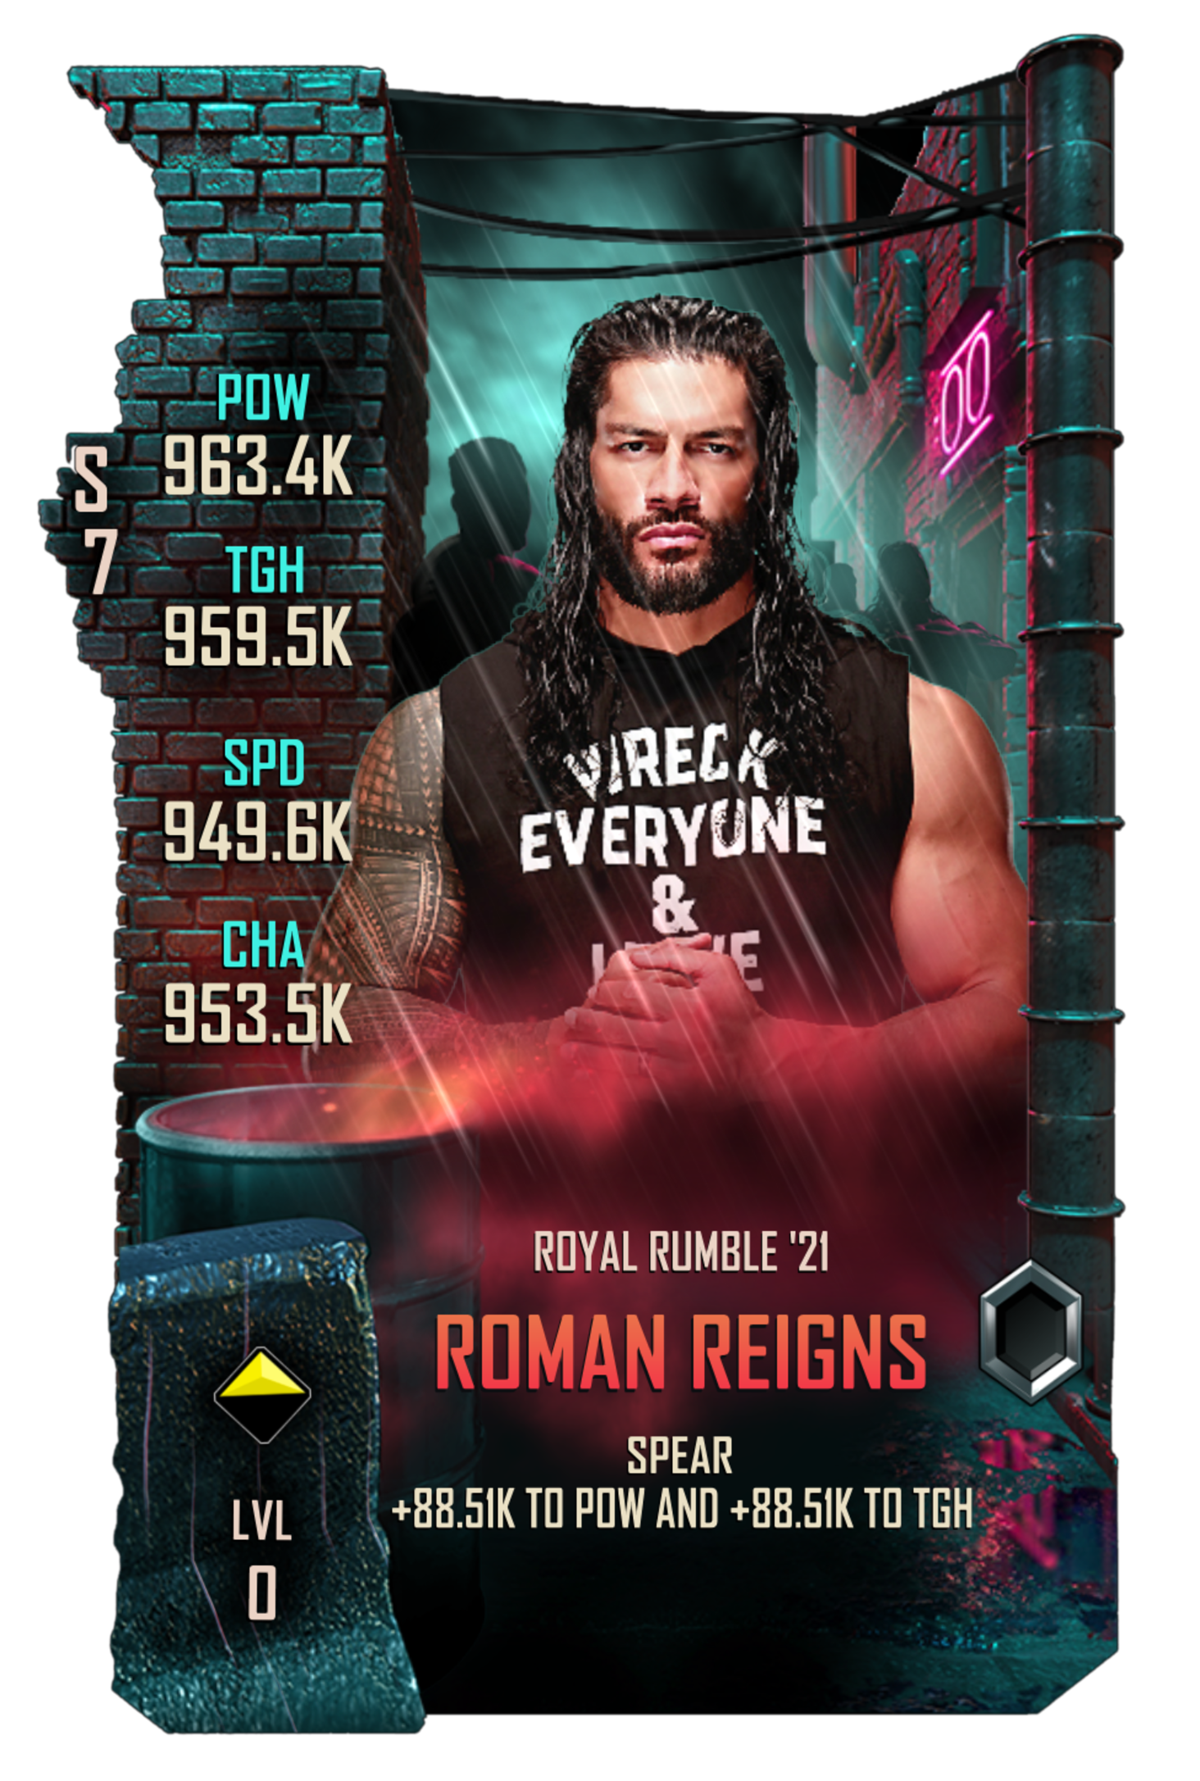 WWESC S7 Roman Reigns Royal Rumble